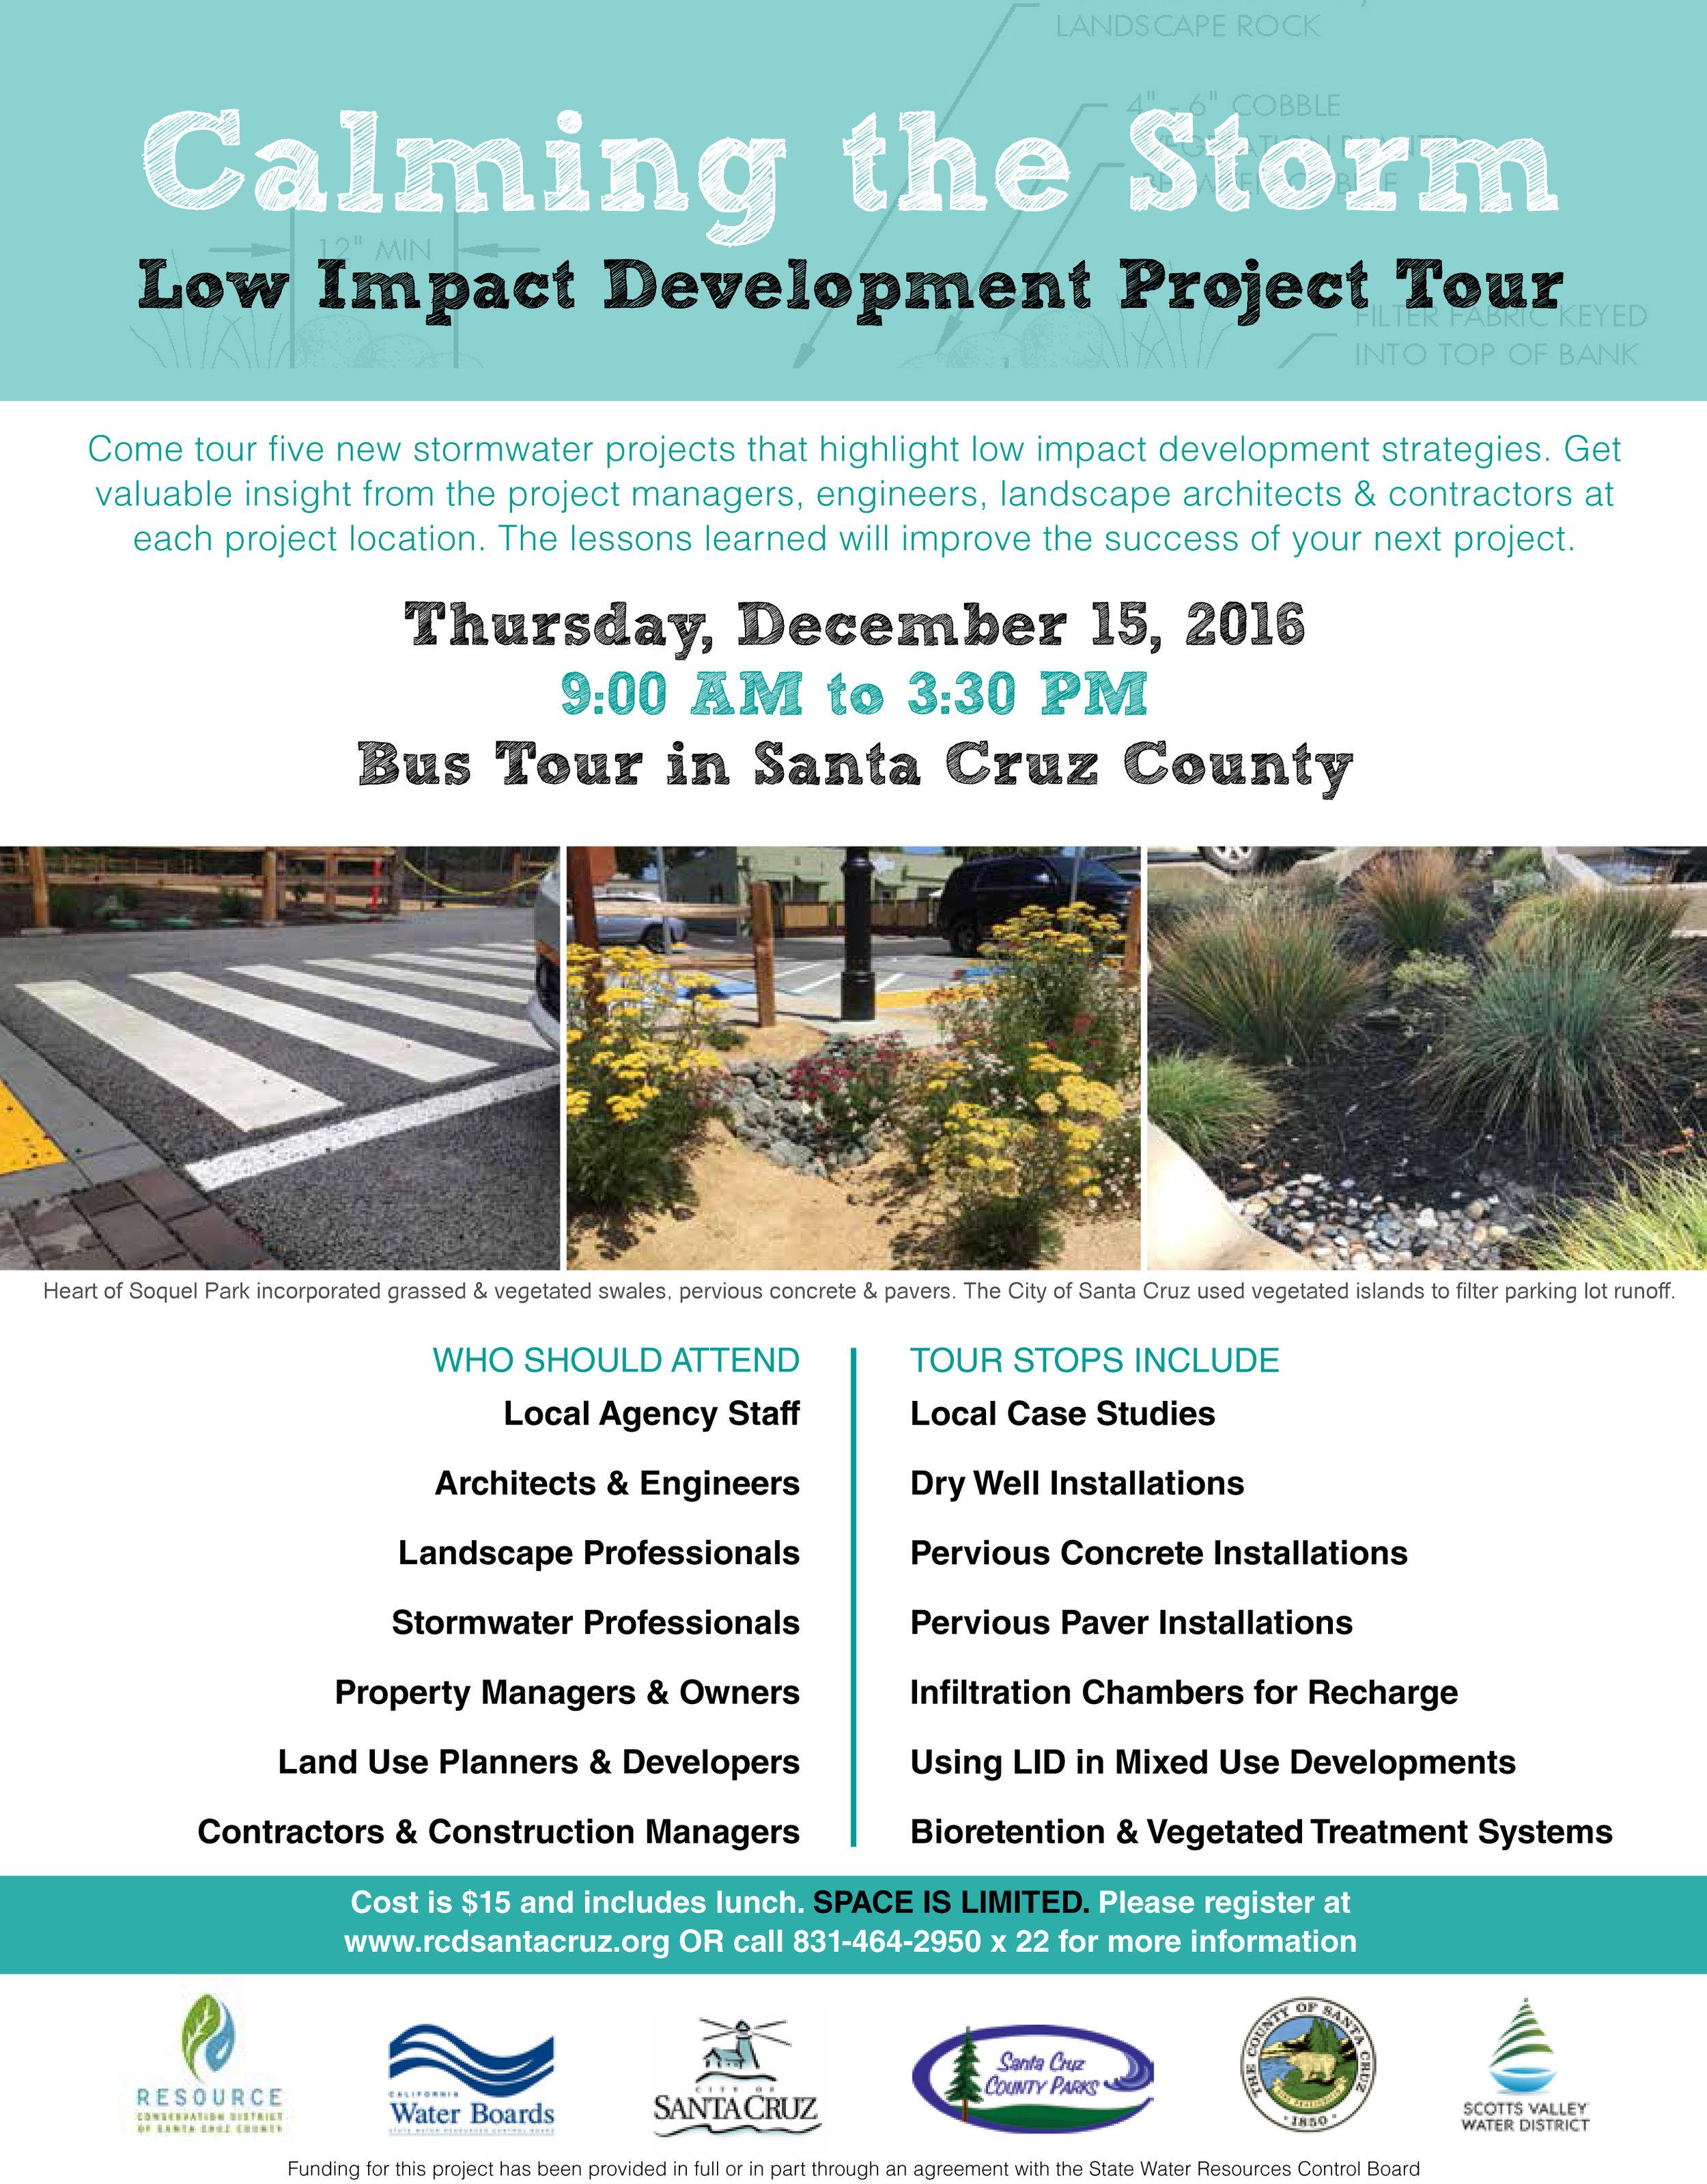 Santa Cruz County-Calming the Storm-LID tour